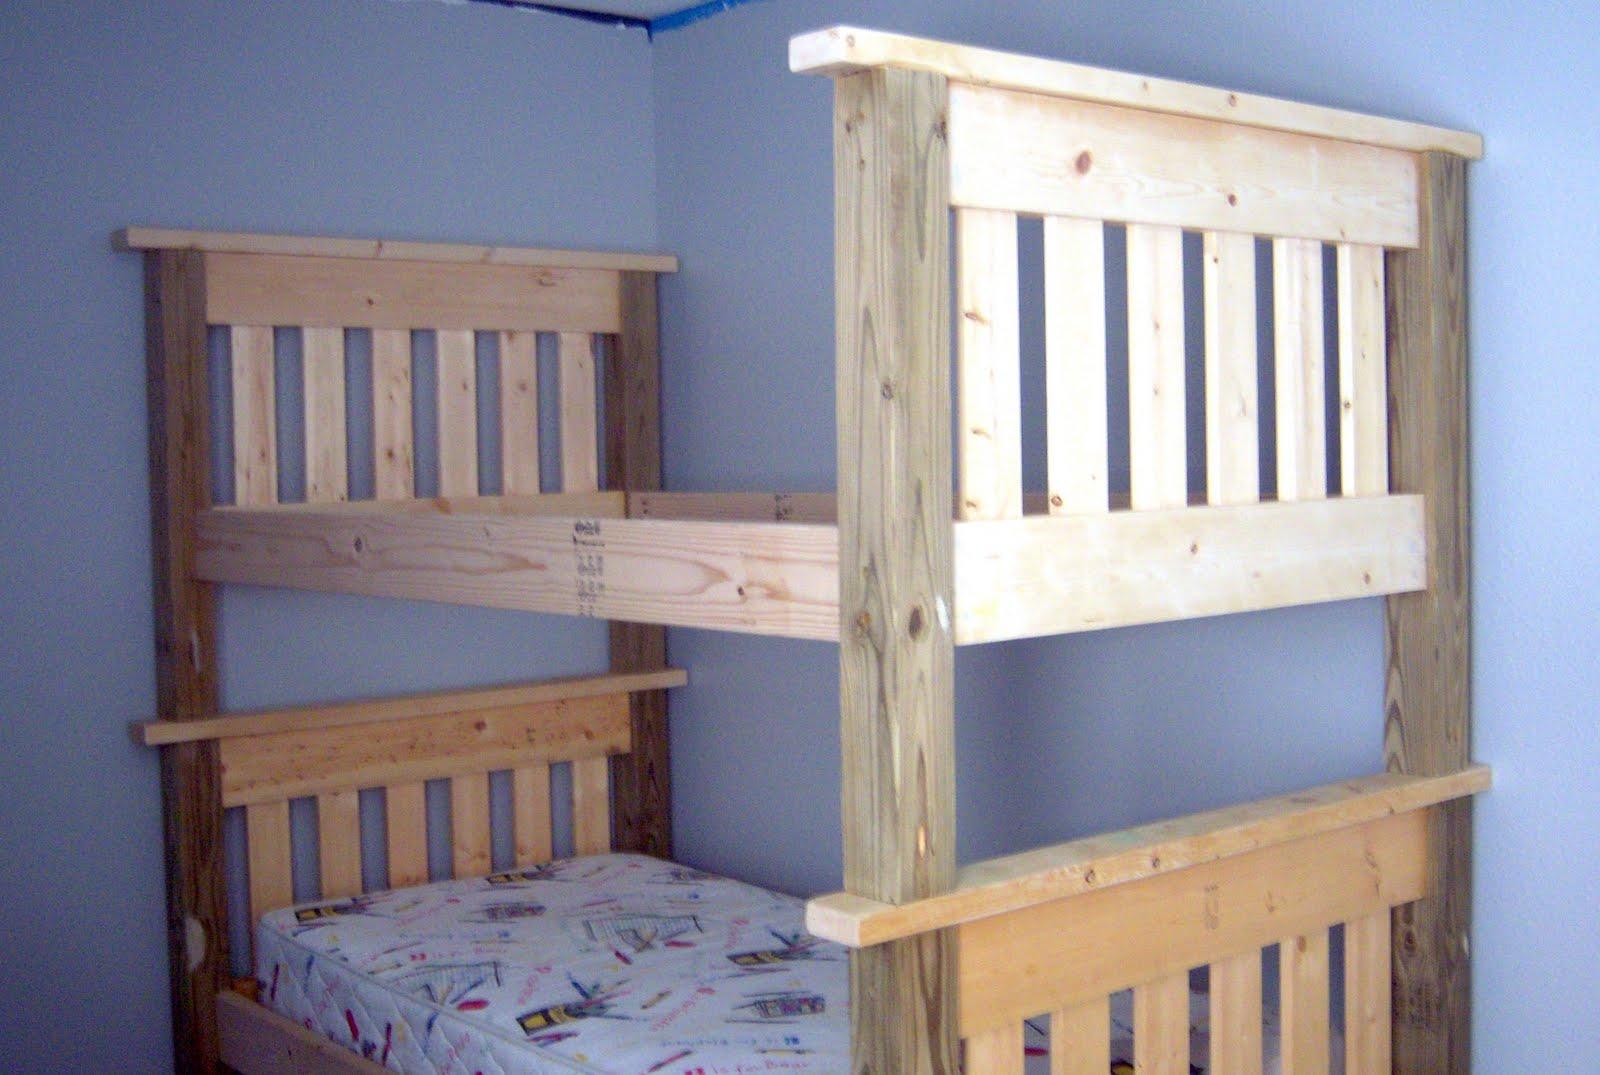 Bunk Bed Guy Of Hendersonville Inspiring Children S Room And Study